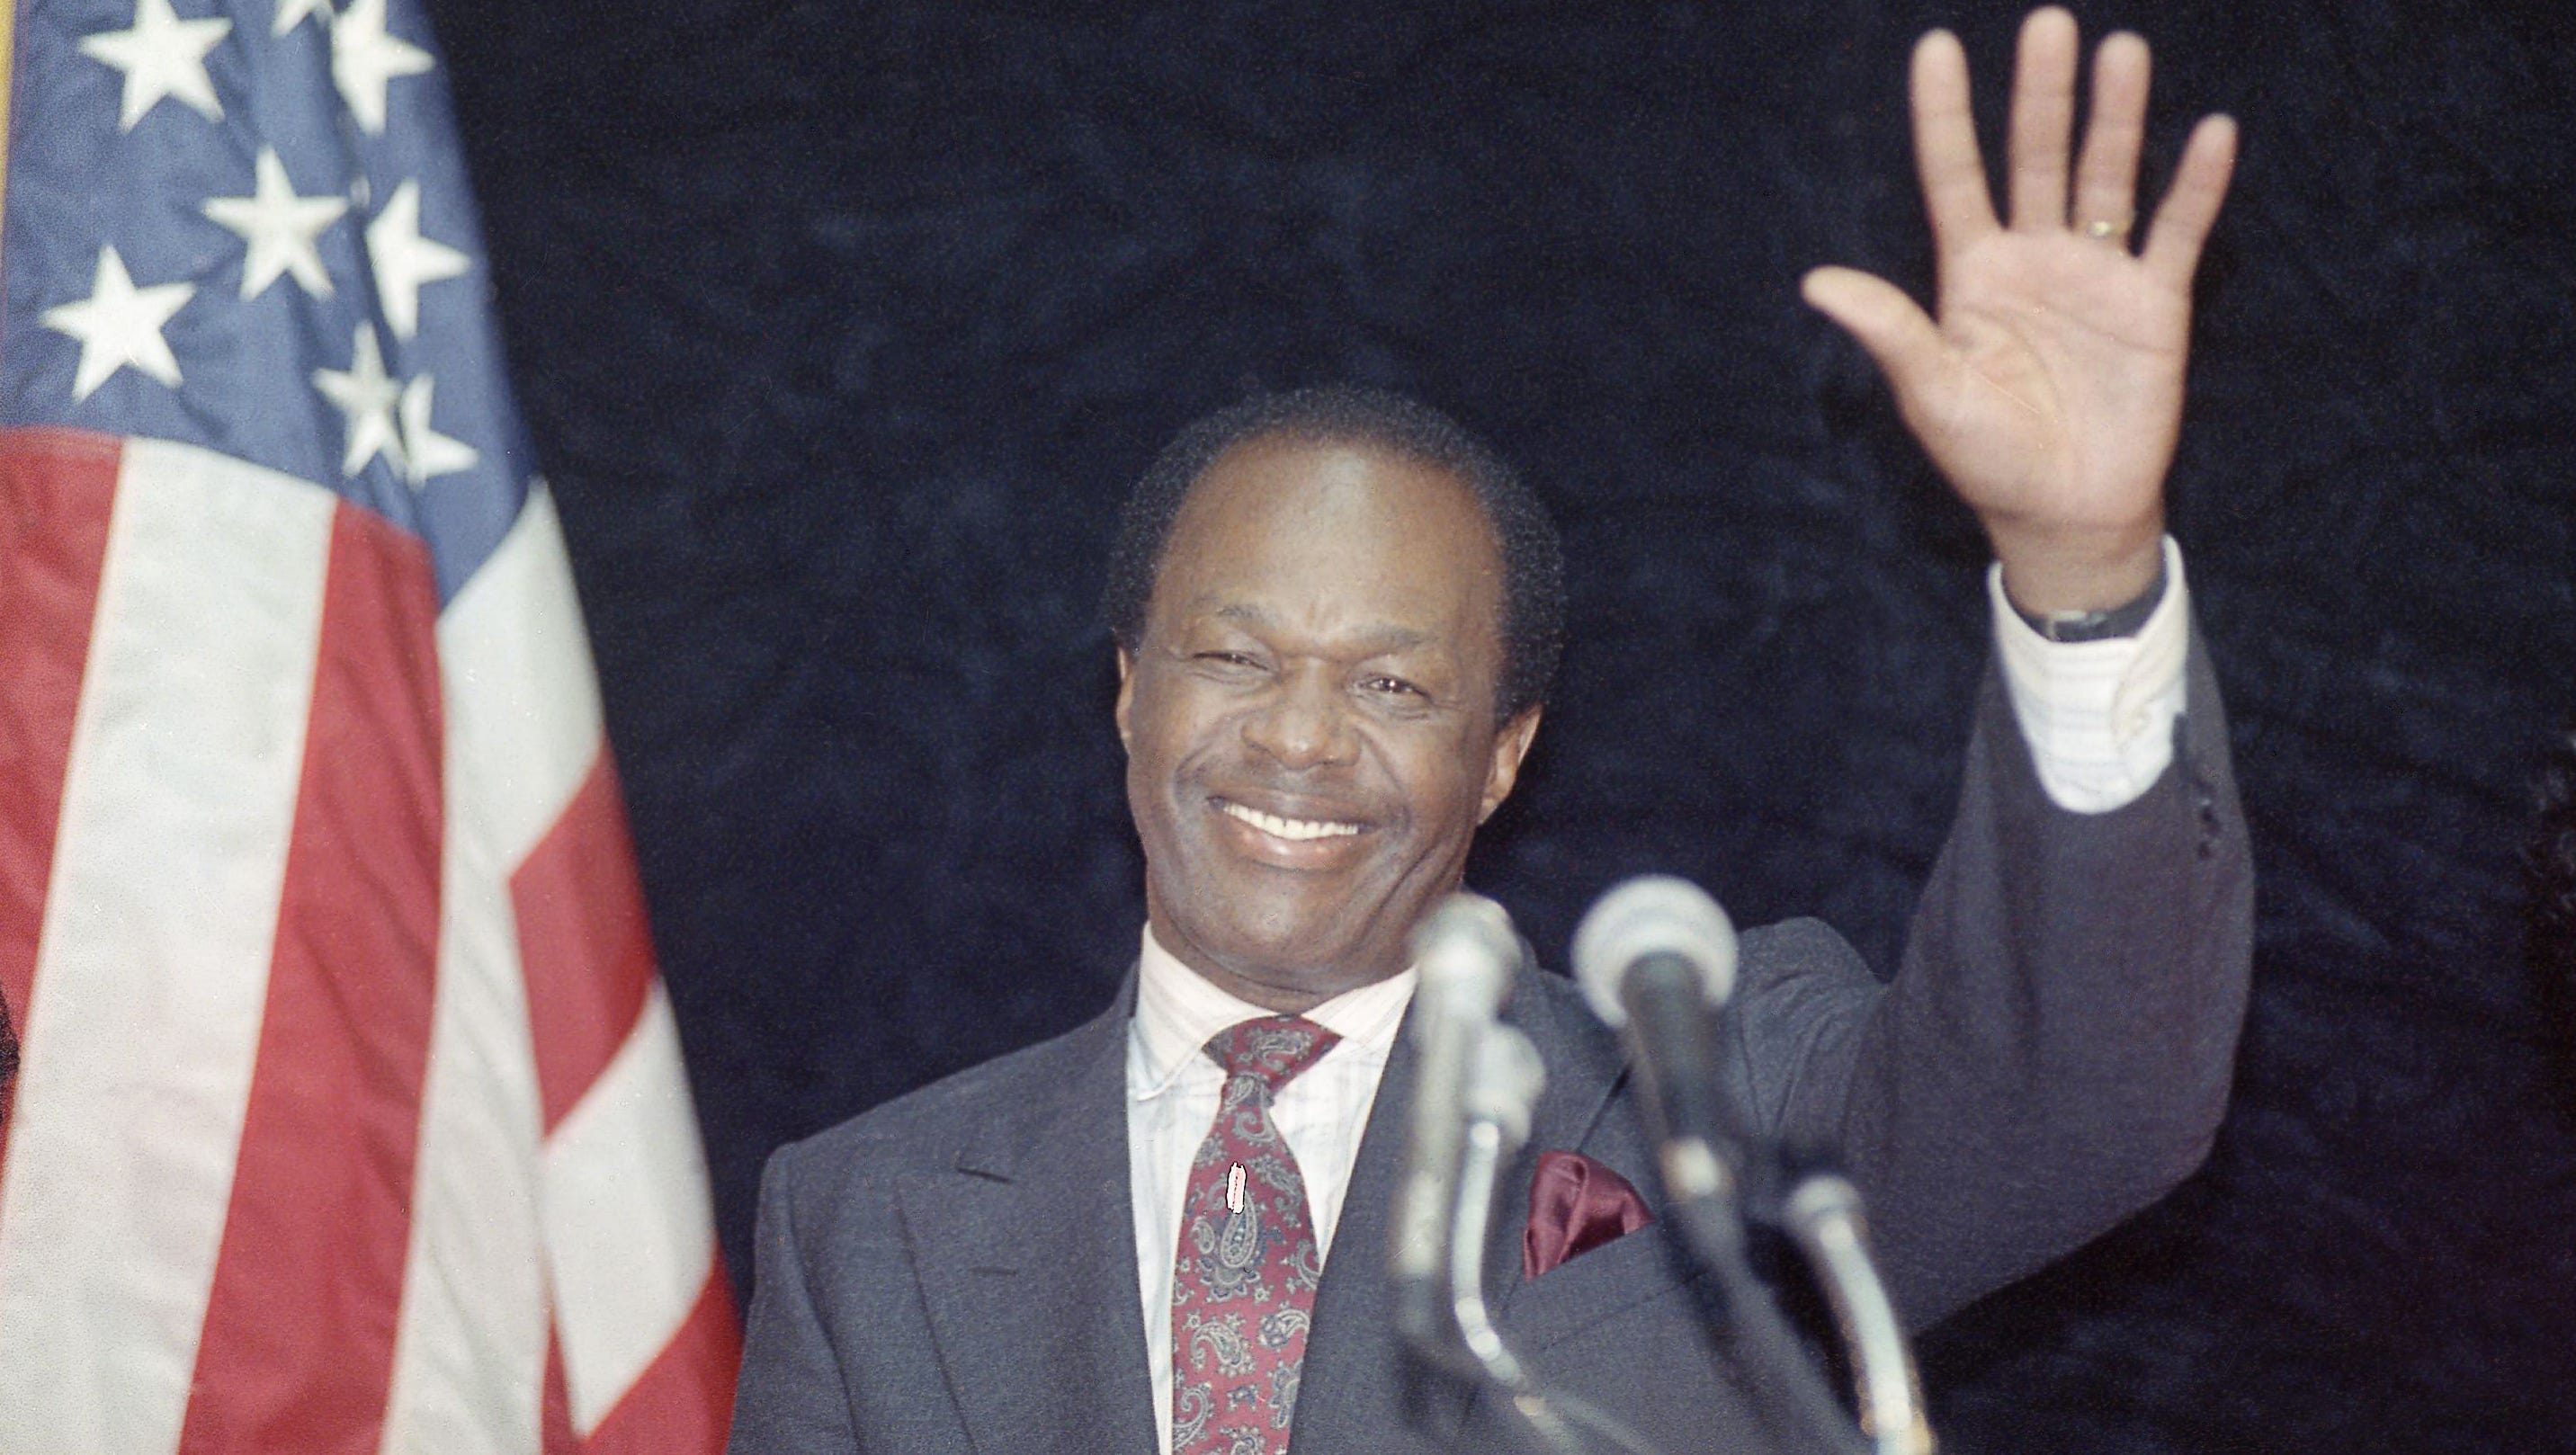 Former DC Mayor Marion Barry dies at 78